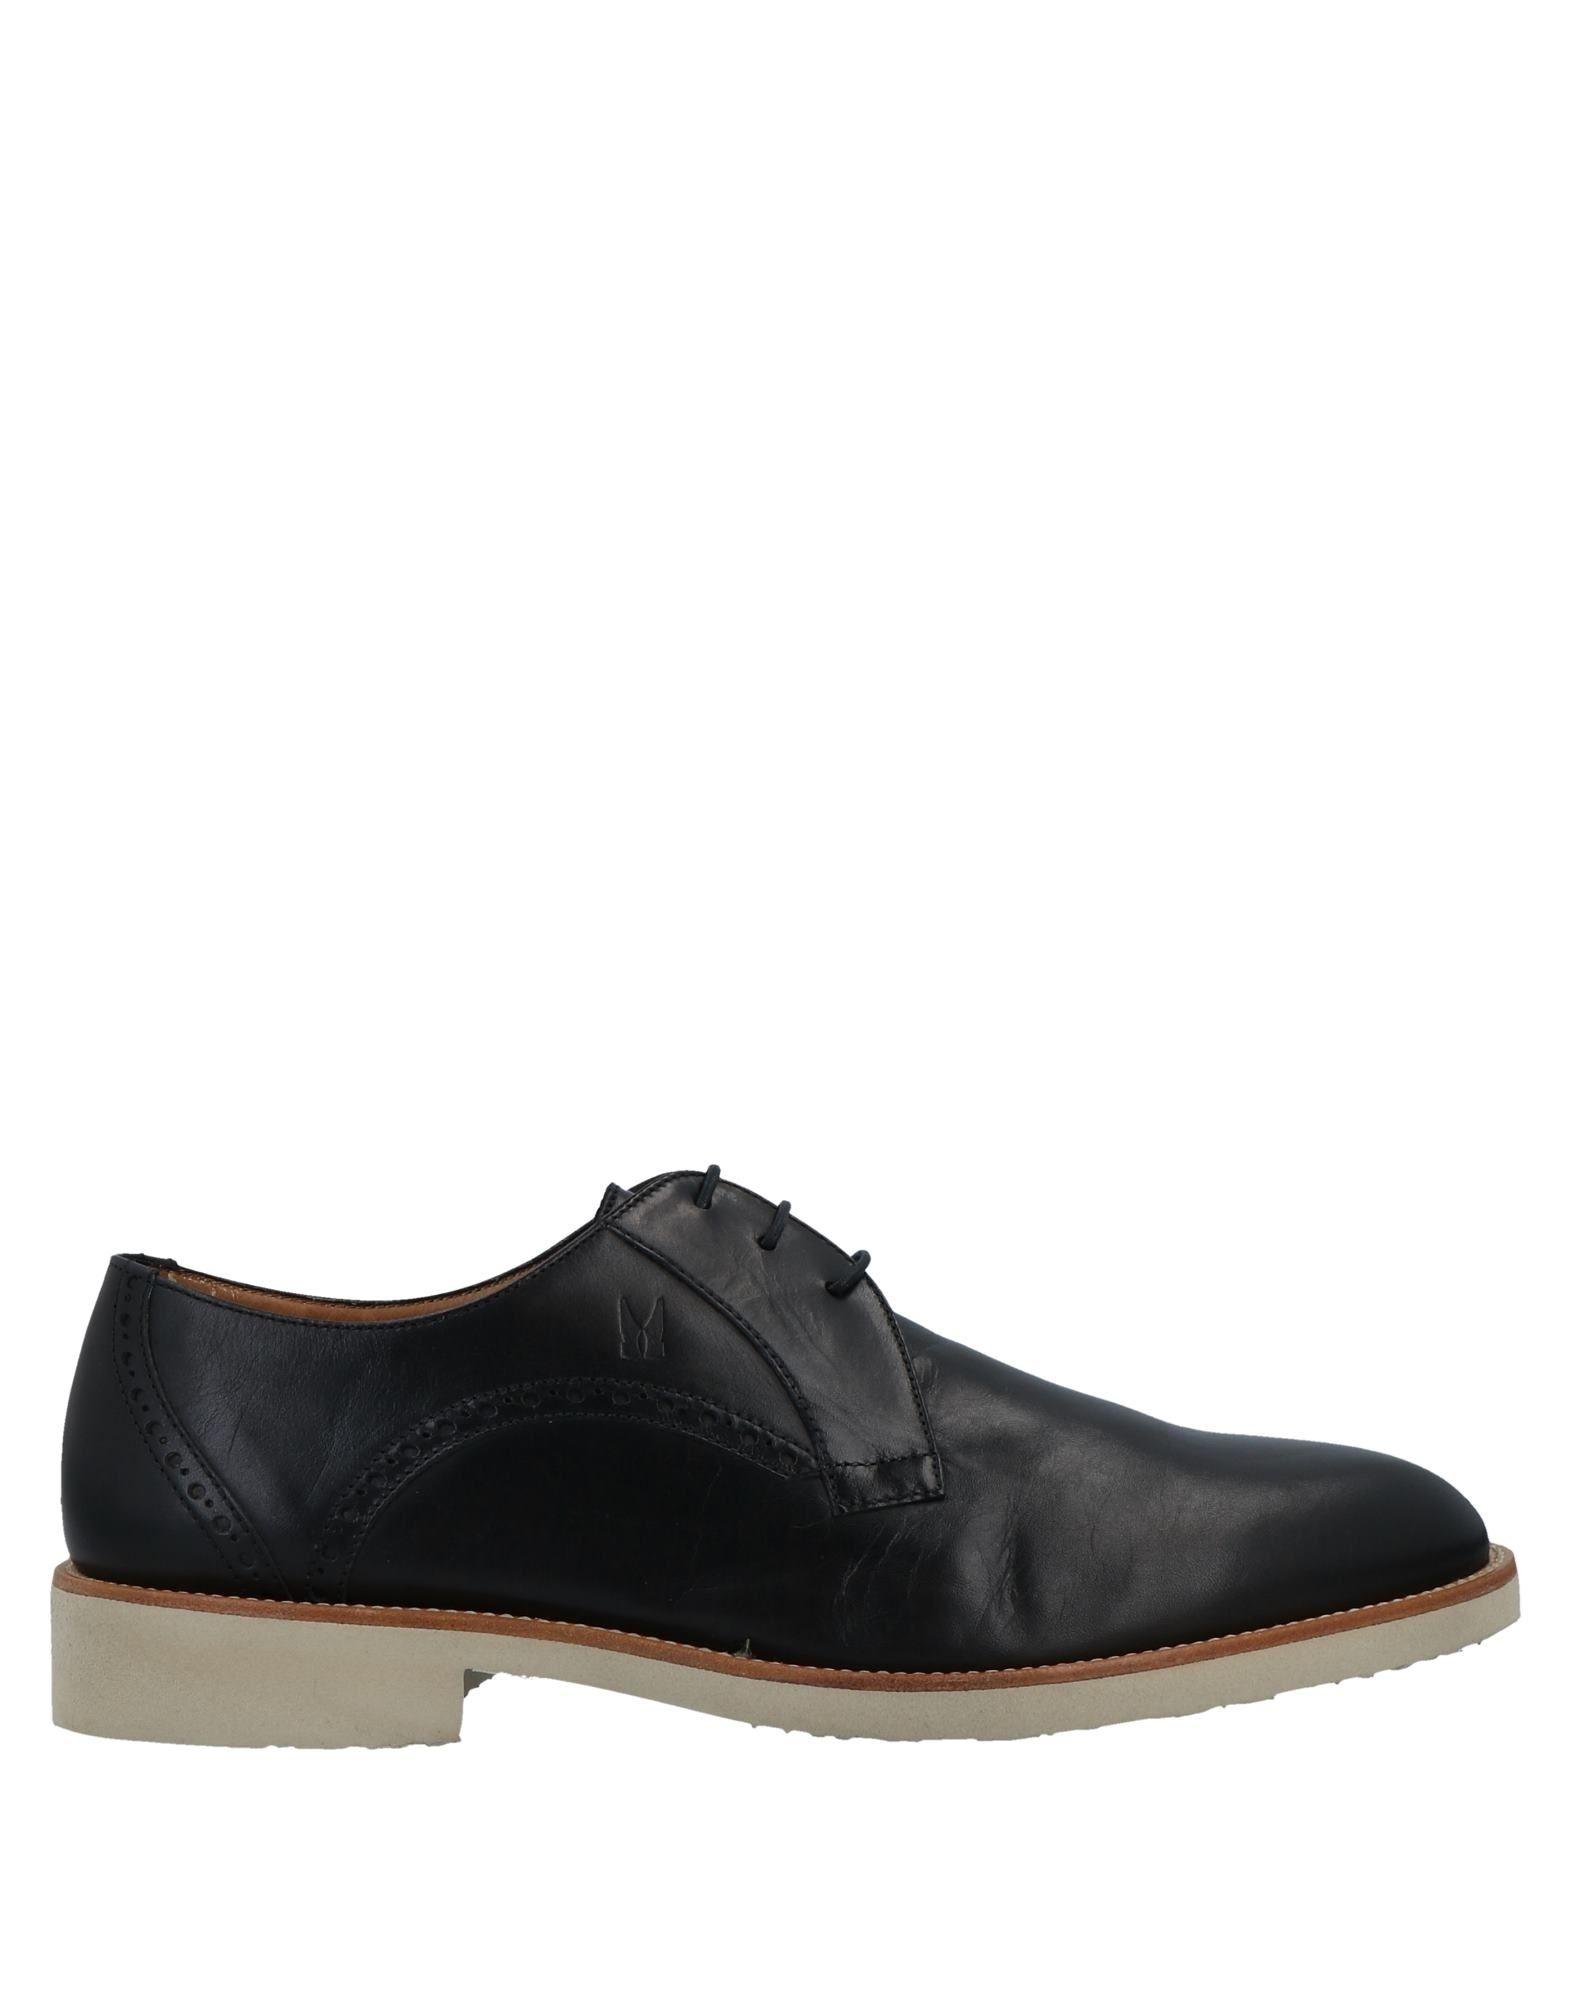 BELTISSIMO by MORESCHI Обувь на шнурках claudia by isaberi обувь на шнурках